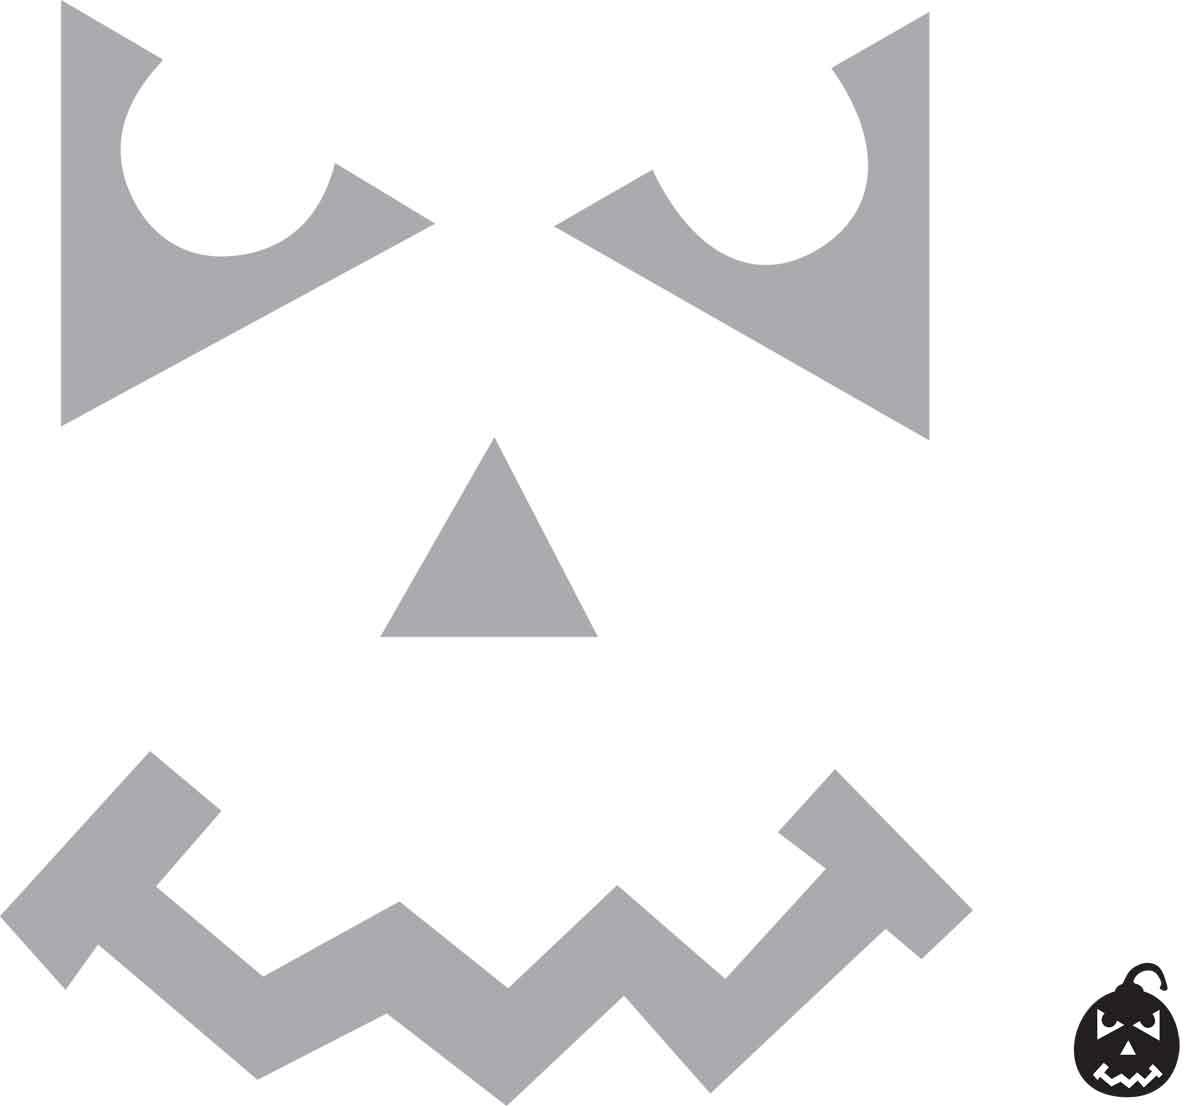 Jack O Lantern Faces For Pumpkin Carving | Skip To My Lou - Jack O Lantern Templates Printable Free